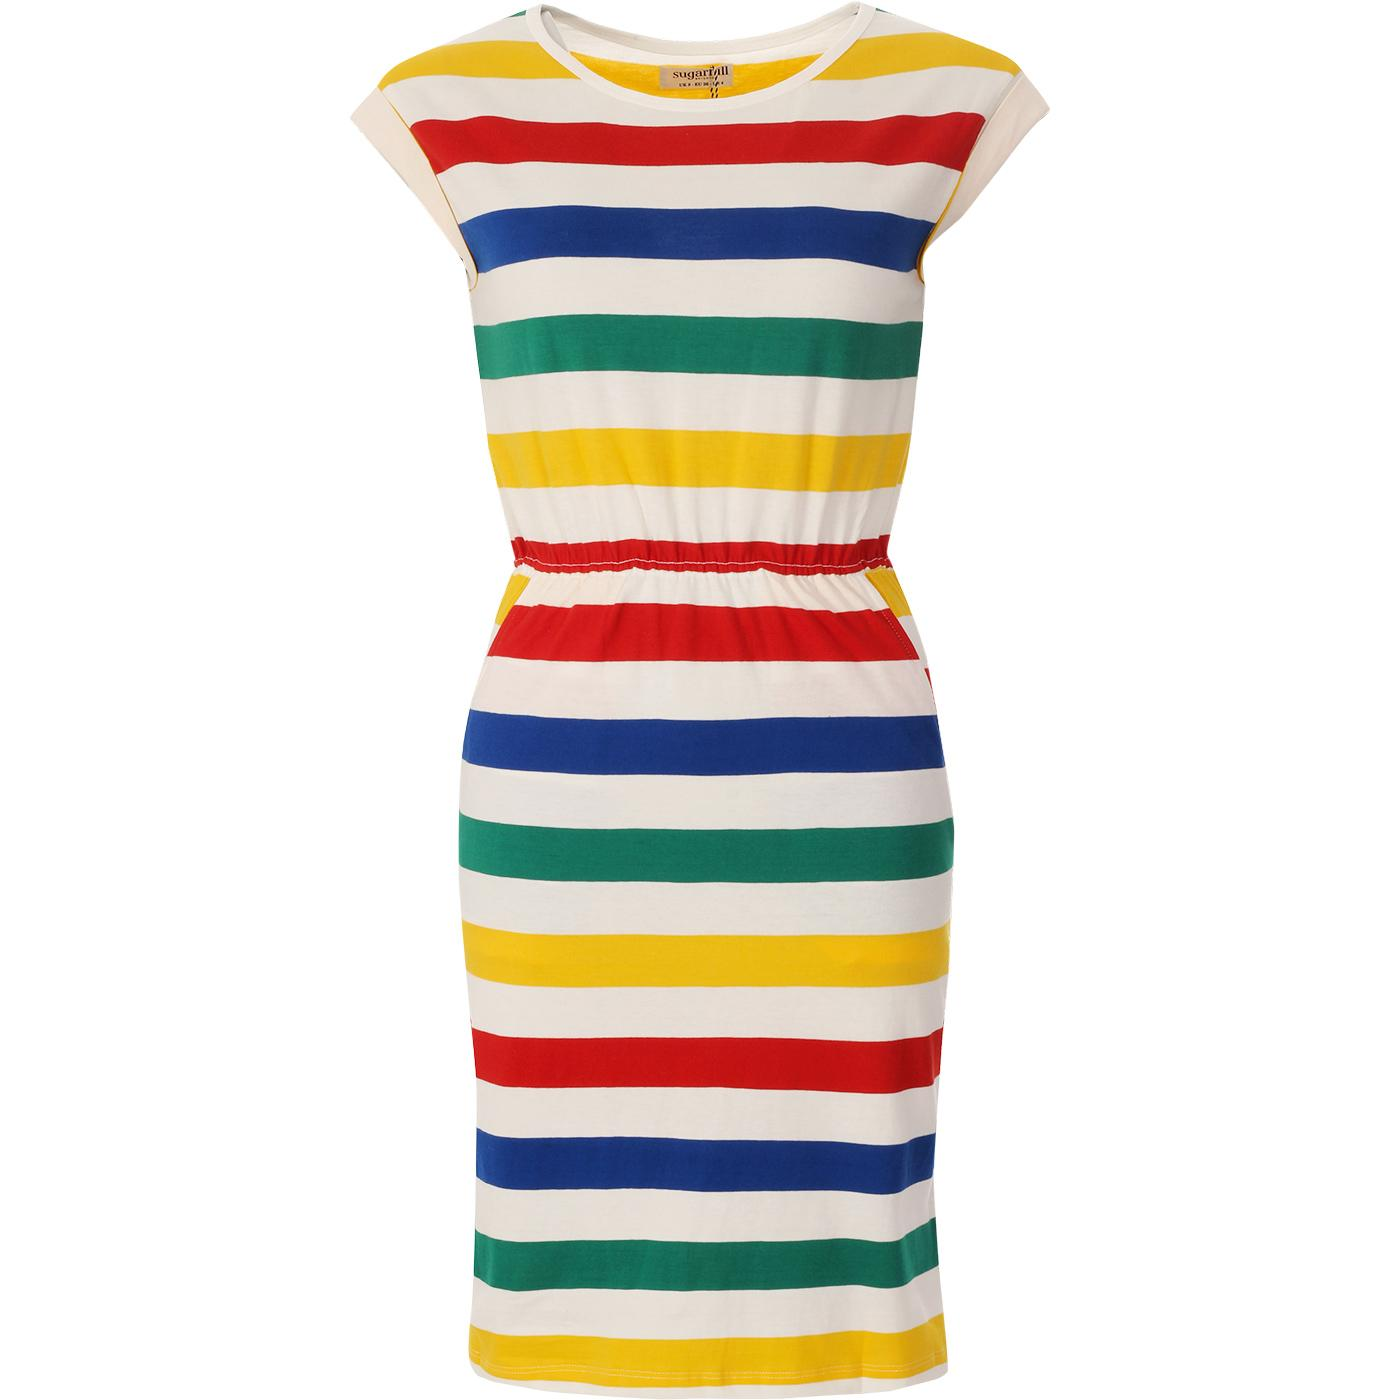 Kate SUGARHILL Retro 1970s Rainbow Stripe Dress